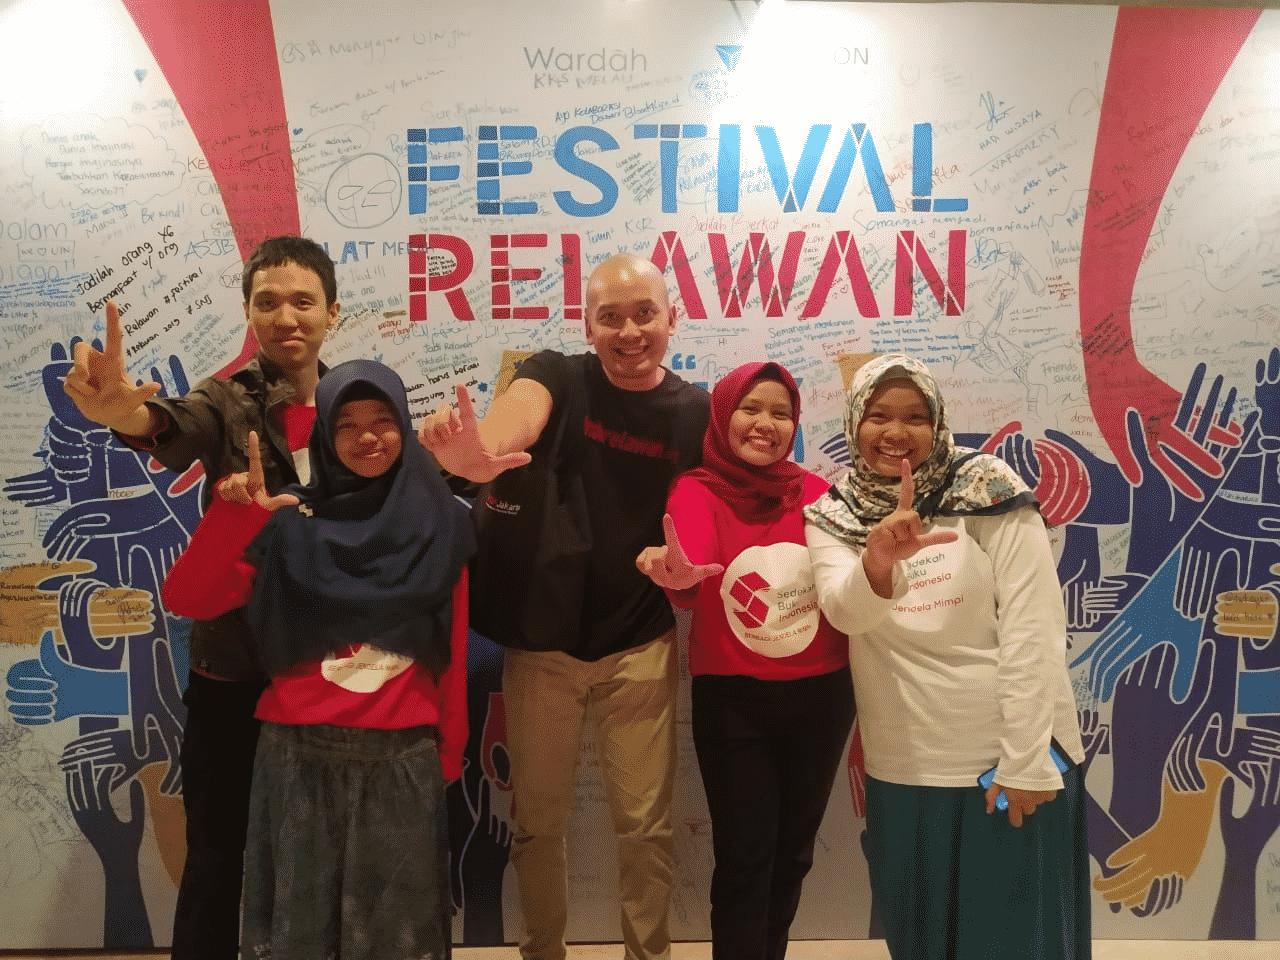 Relawan, Lampaui Kemanusiaan